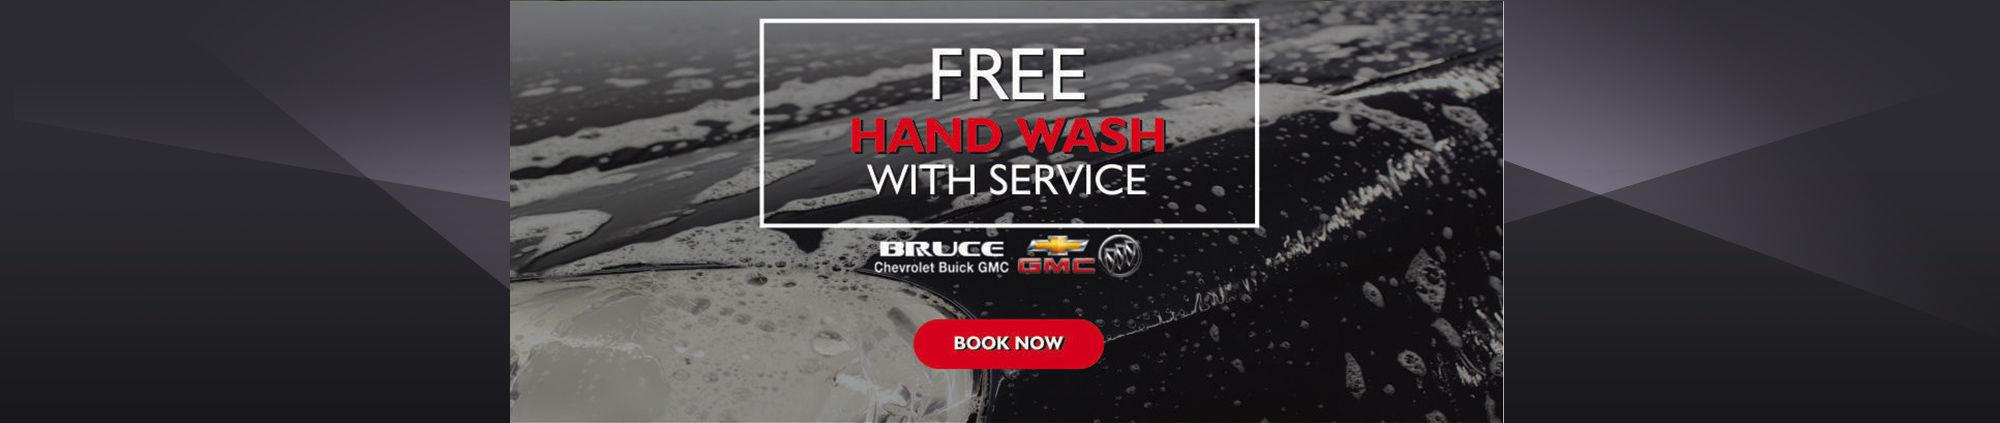 Free Hand Wash (Copy)